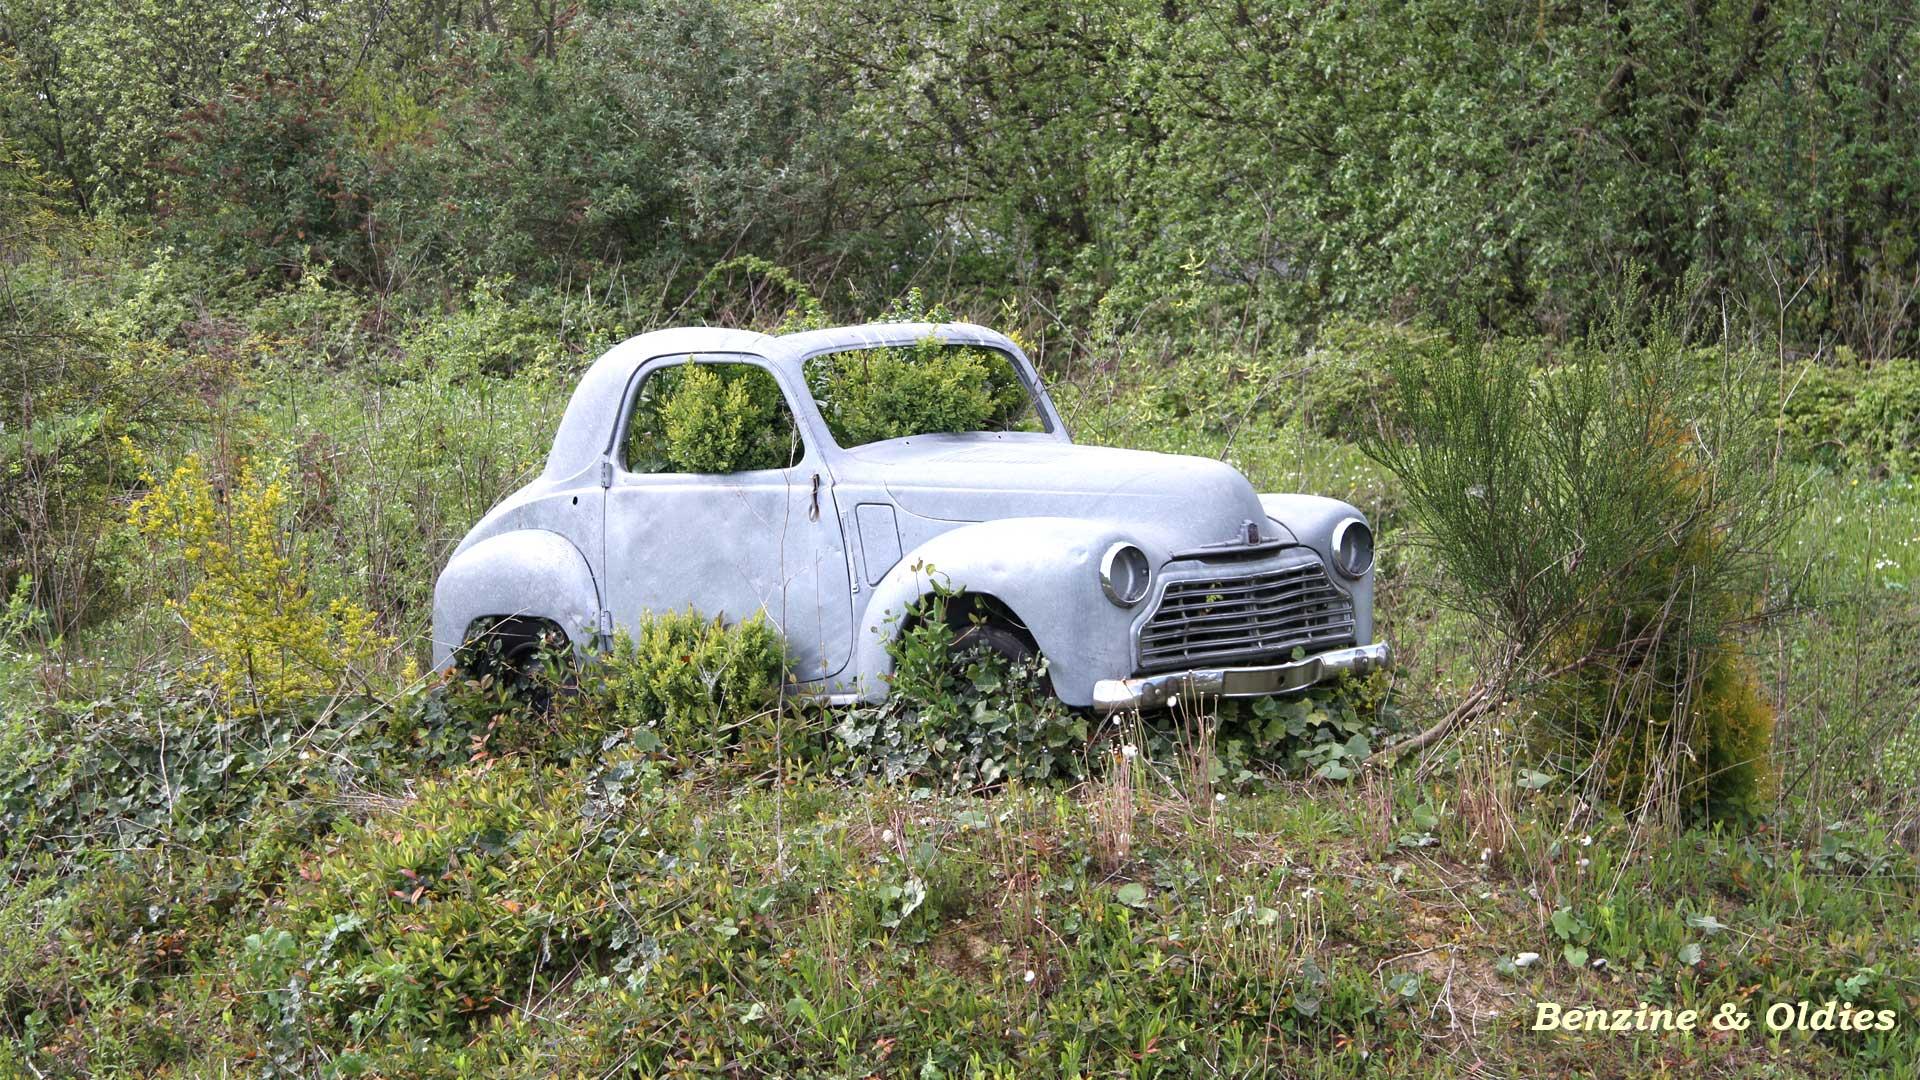 une Simca 6 carrosserie aluminium oubliée dans la nature - Simca6 842785simca6street05w19201080